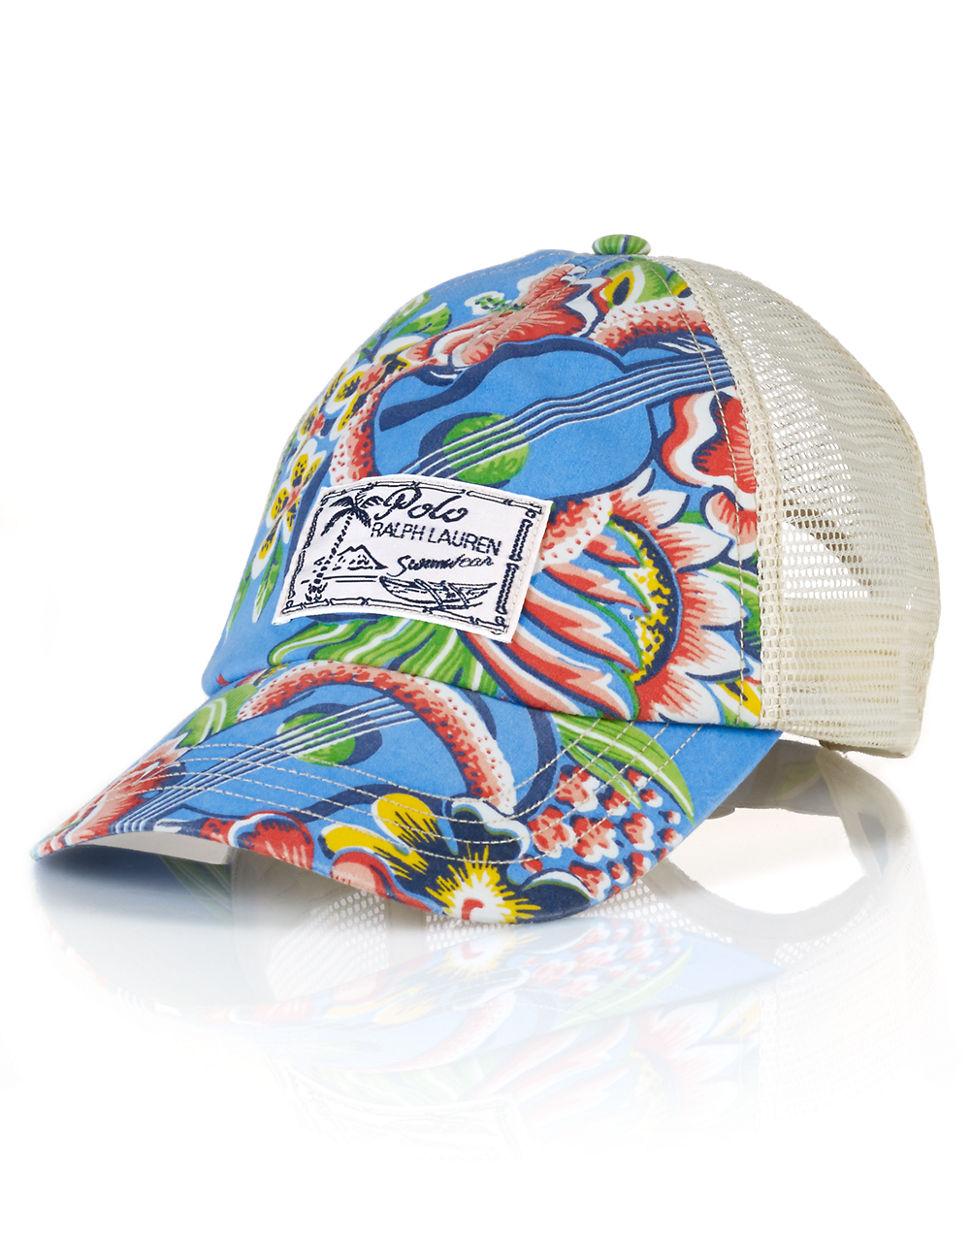 9cd5527c Polo Ralph Lauren Tropical Trucker Hat in Blue for Men - Lyst